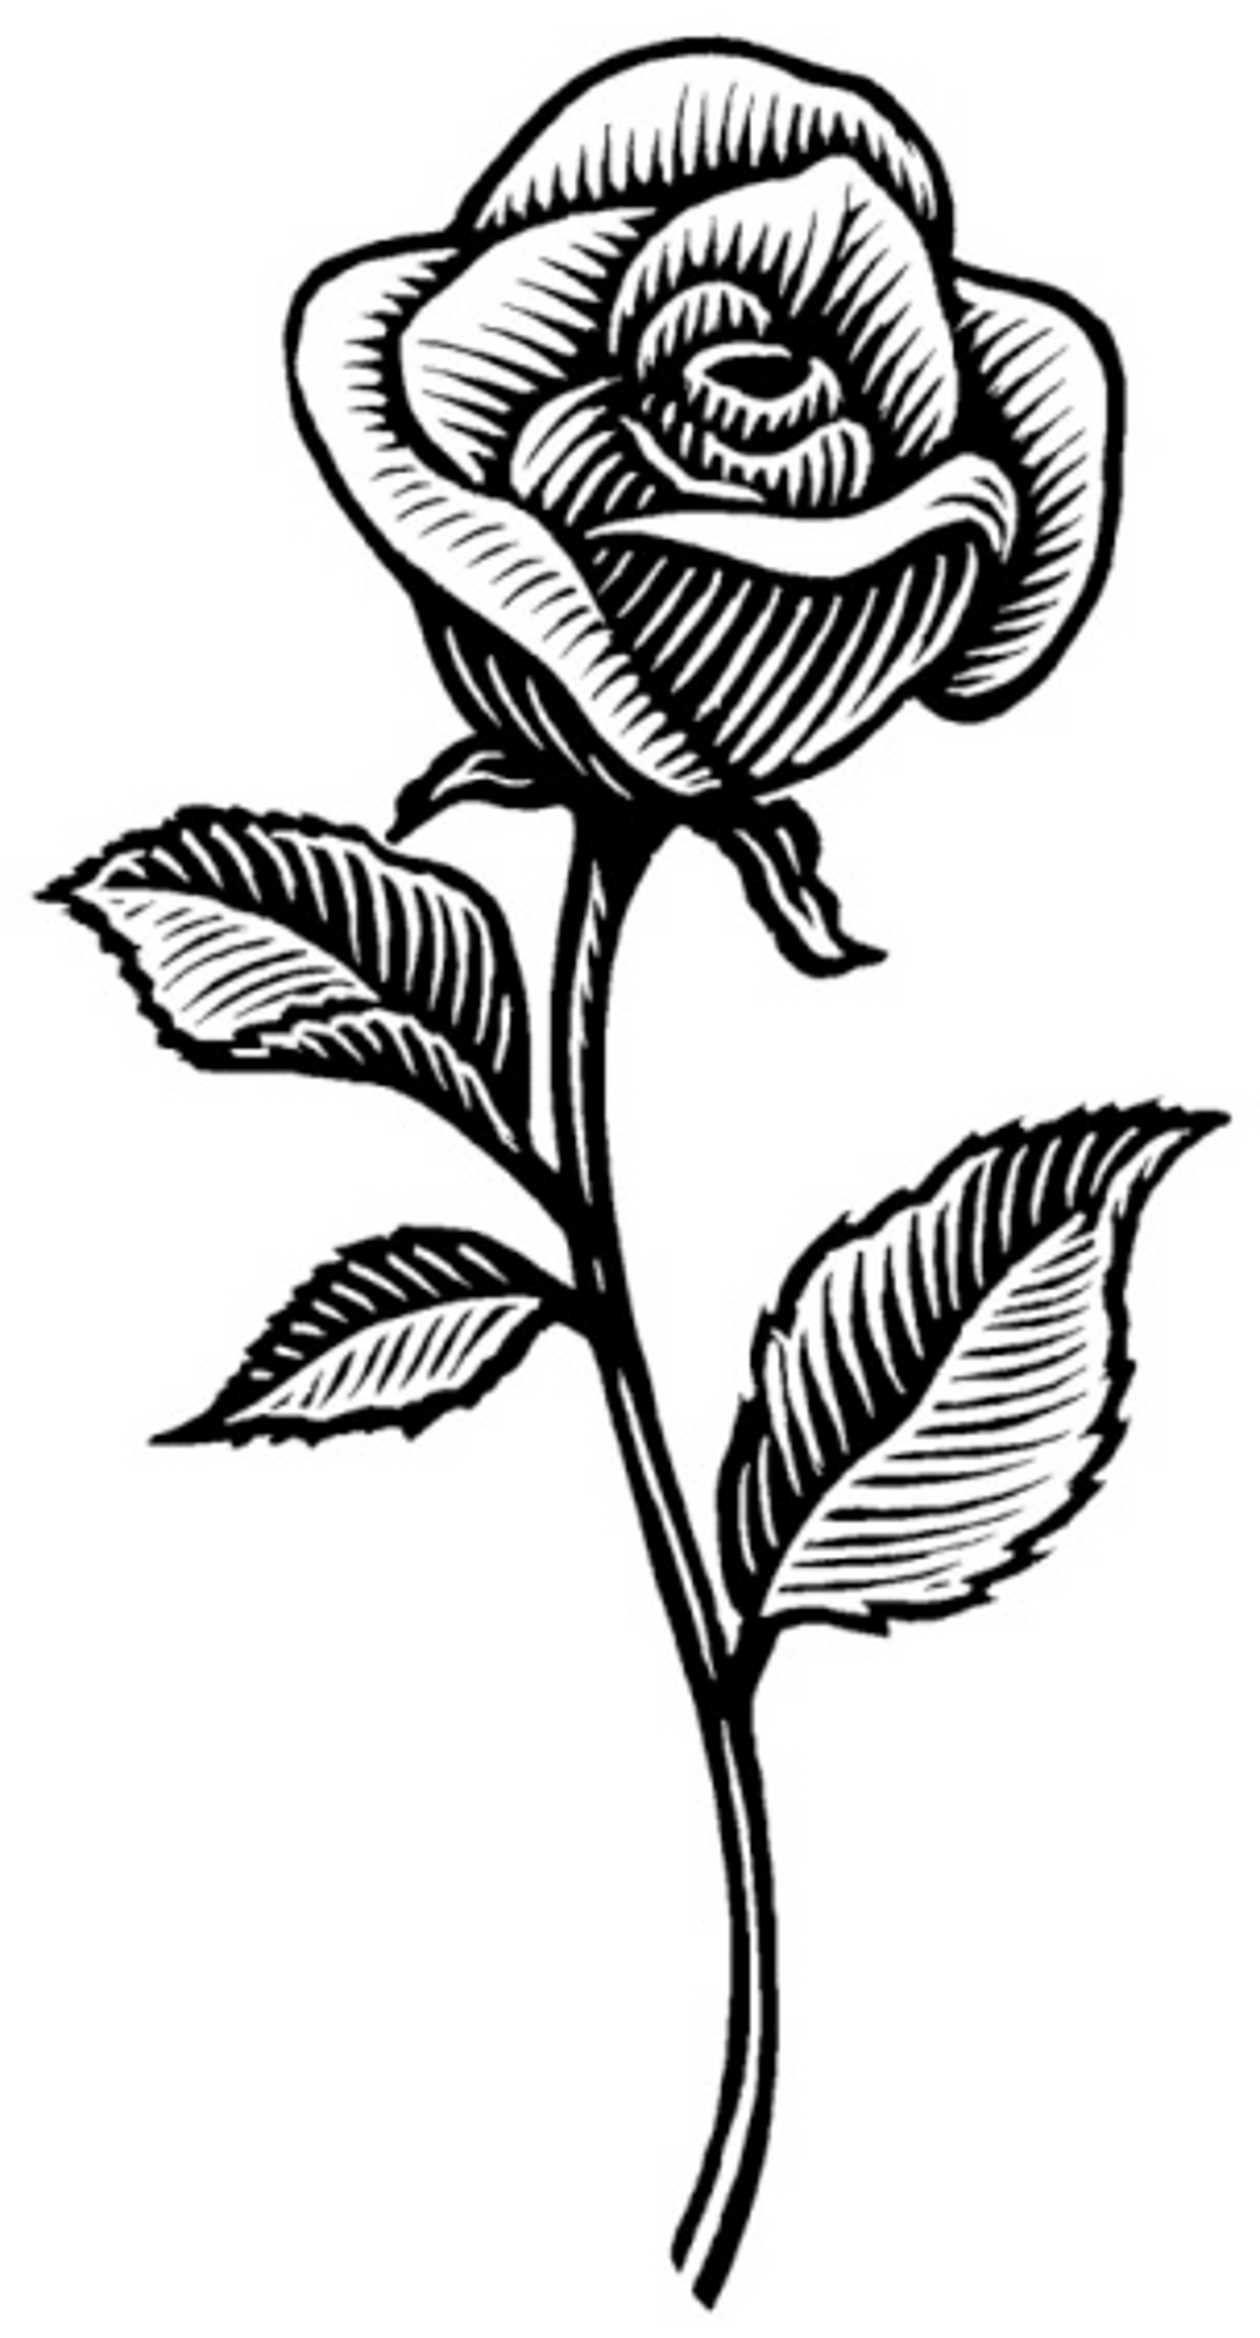 manos-con-rosas-en-dibujos.jpg 1.260×2.338 píxeles | LineArt | Pinterest